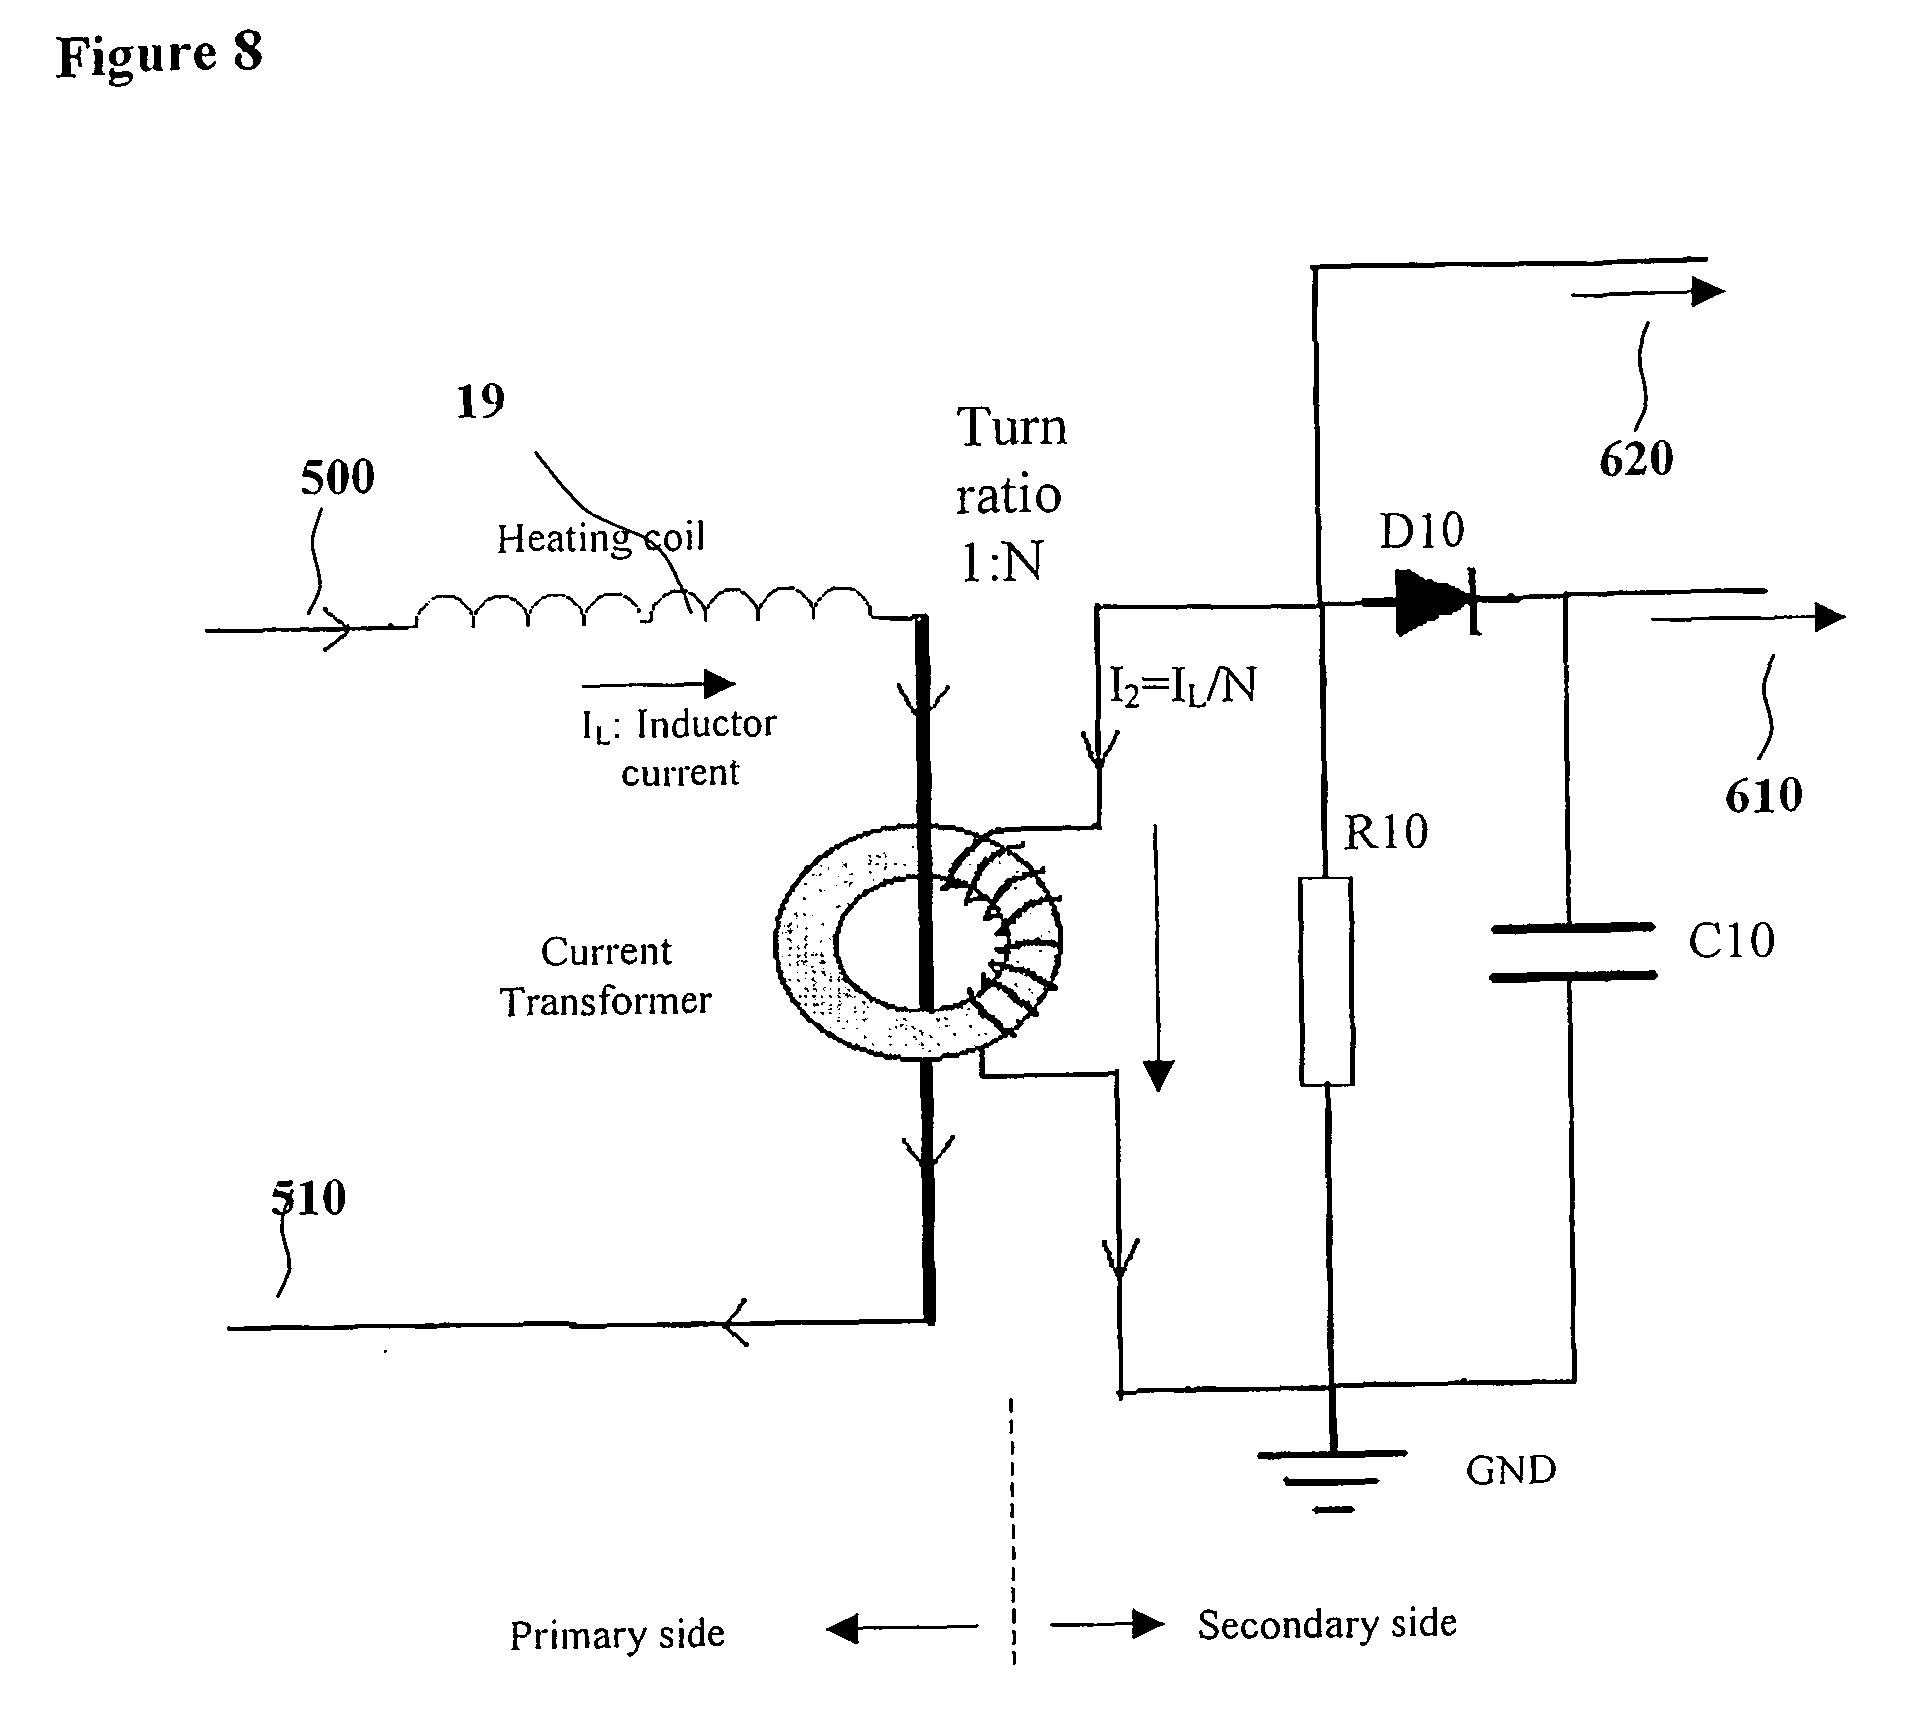 Wiring Diagram For Induction Heating Free You Speed Control Motors 1 Circuit Tradeoficcom Hob Schematics Rh 9 14 8 Jacqueline Helm De Homemade